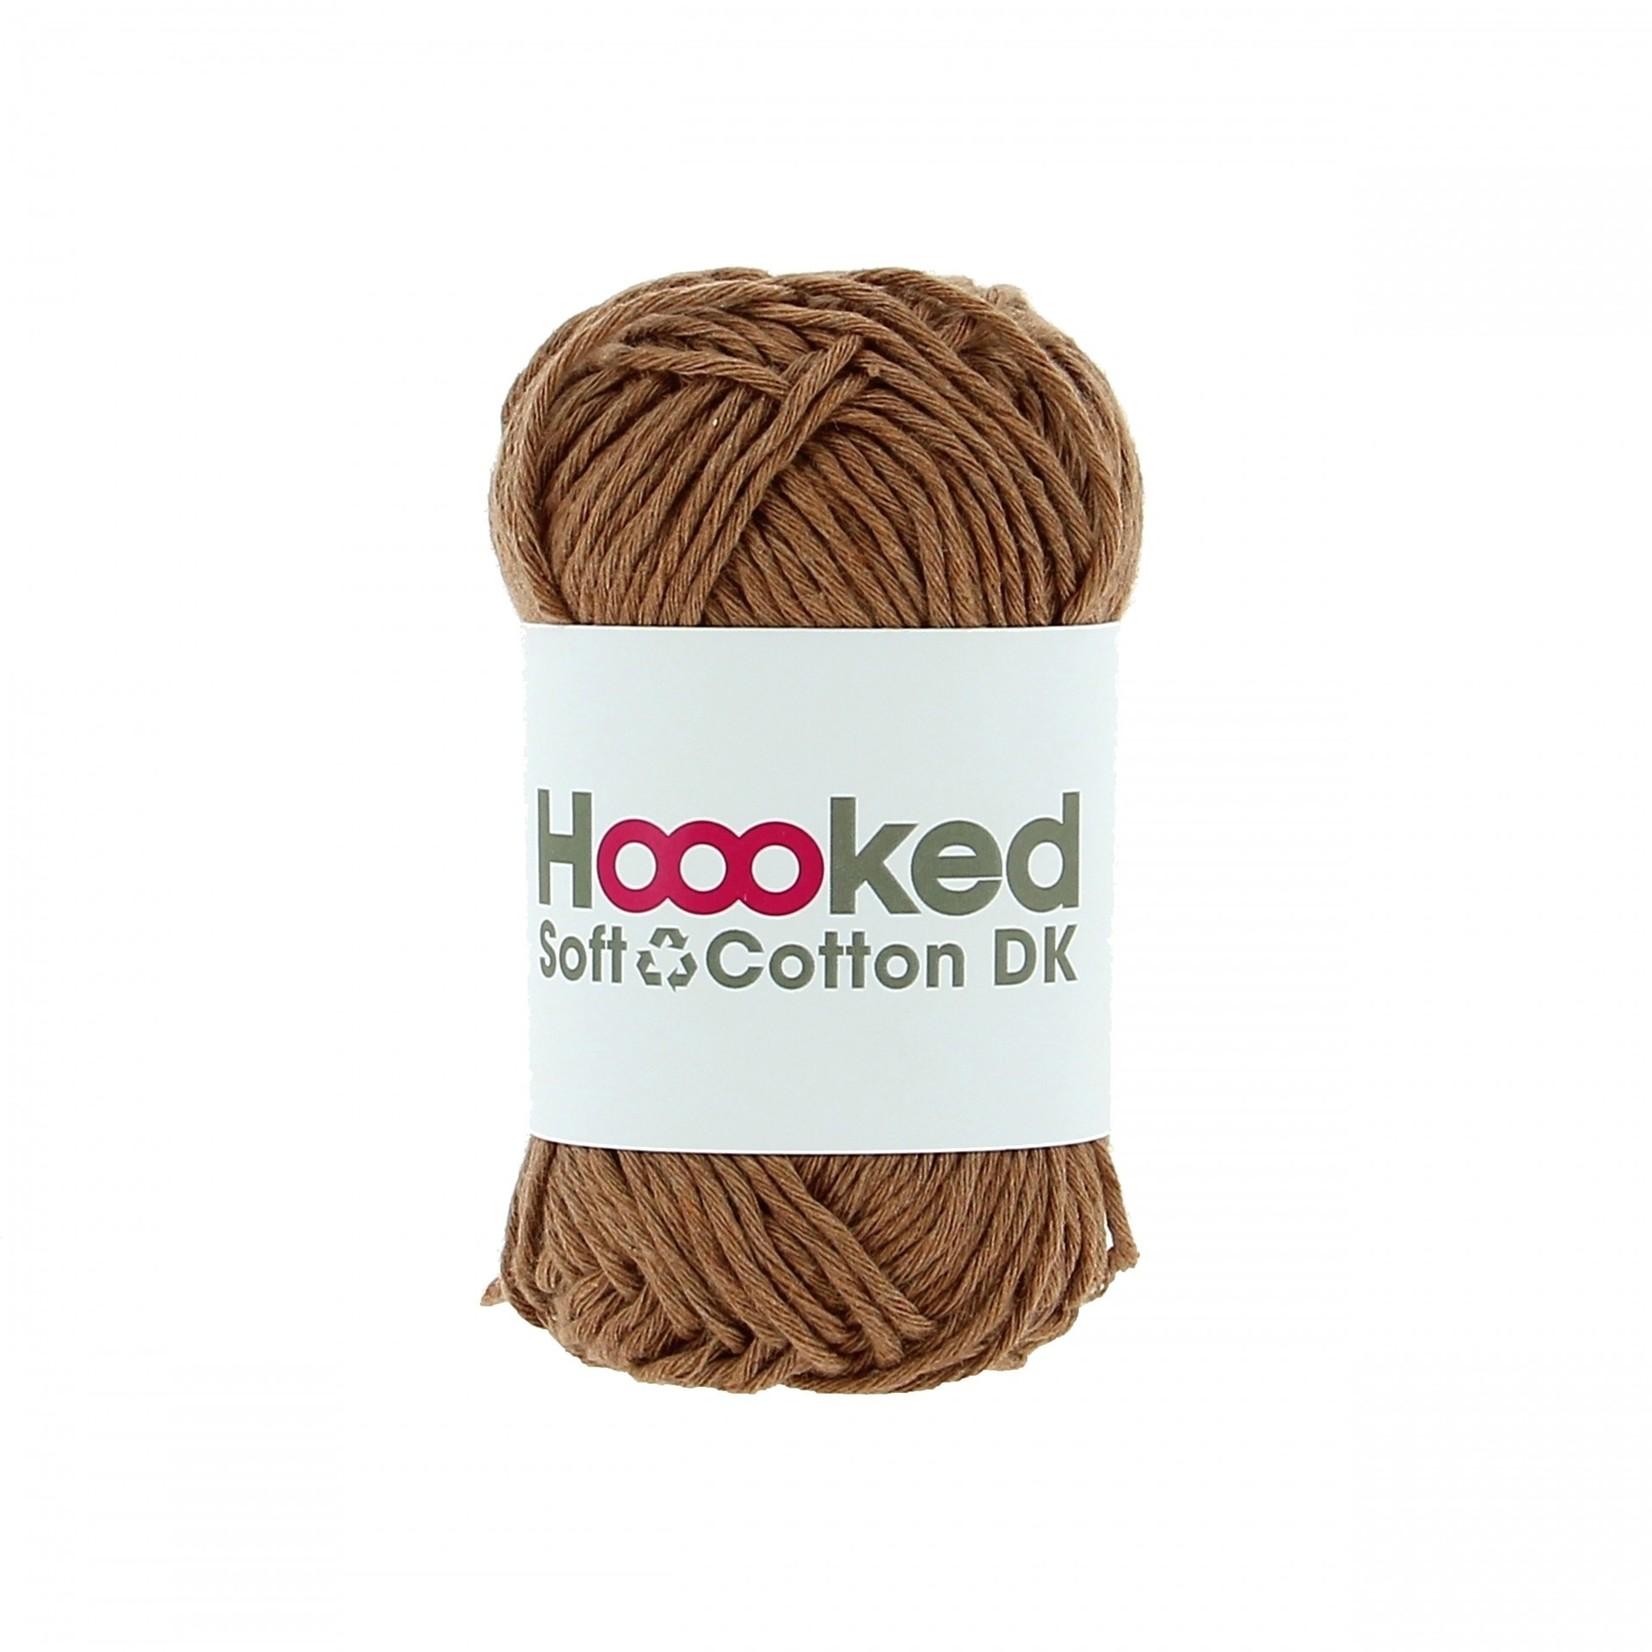 Hoooked Hoooked Soft Cotton DK Caïro Caramel bundel 5 x 50 gr. / 85 m.